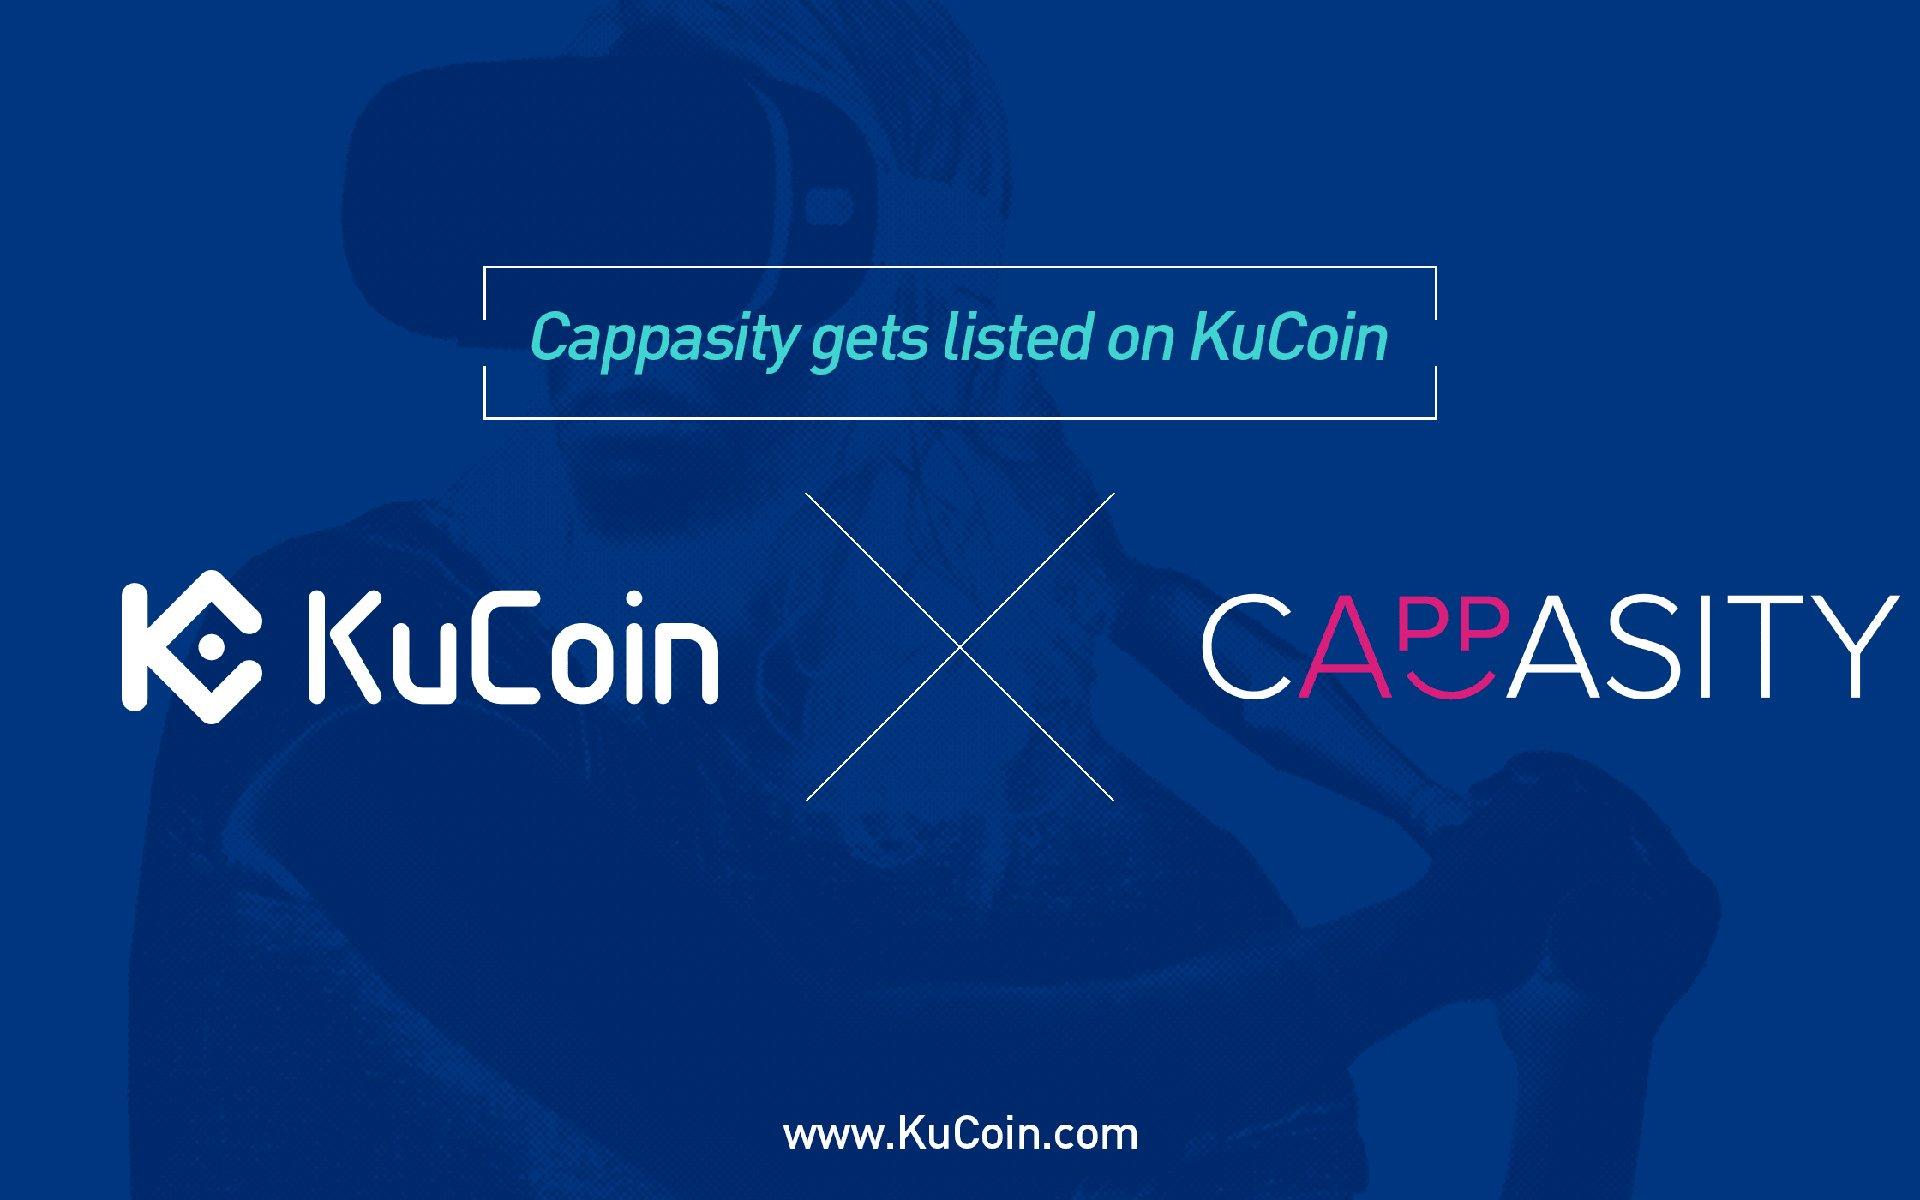 Cappasity(CAPP) gets listed on KuCoin!